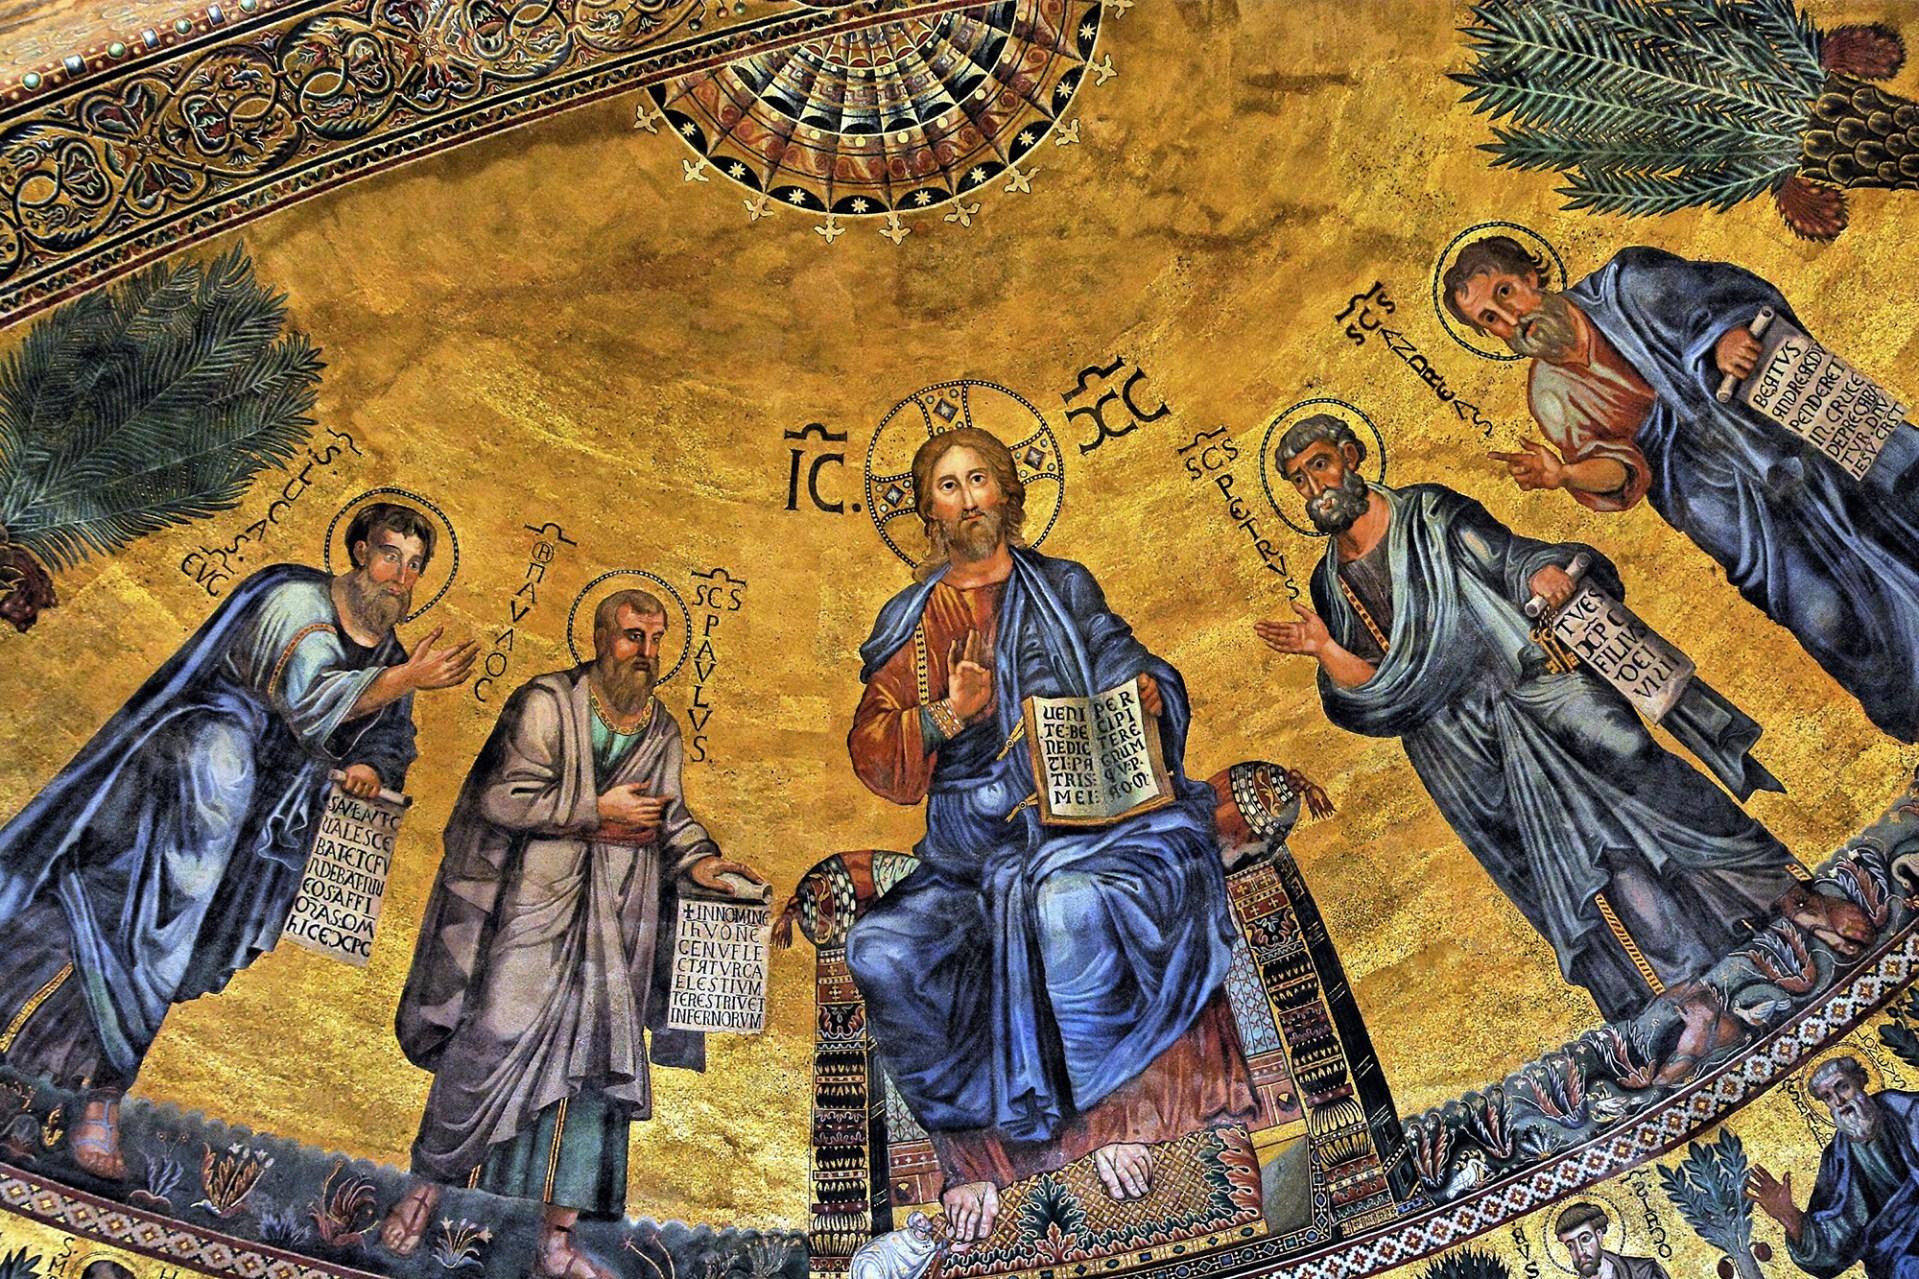 https://wp.en.aleteia.org/wp-content/uploads/sites/2/2021/01/web3-Apse_mosaic_Basilica_of_St_Paul_Outside_the_Walls-wiki.jpg?w=1920